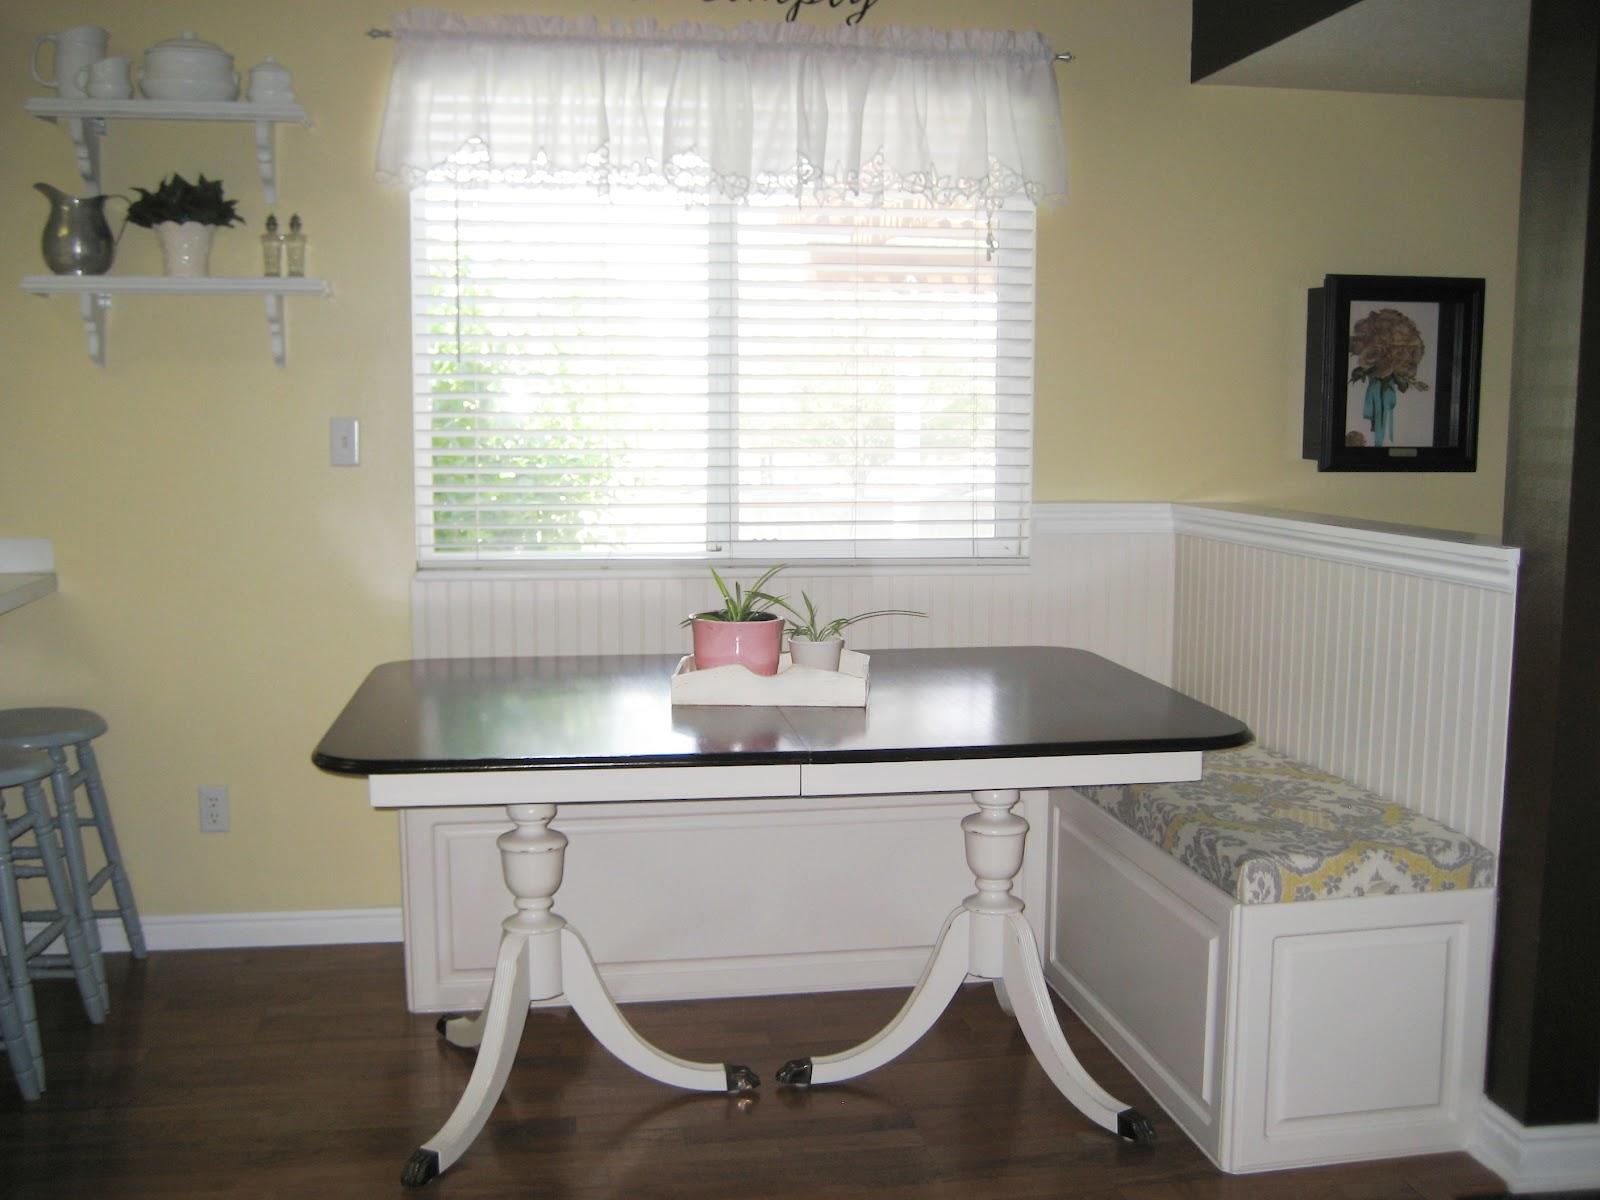 diy breakfast nook with storage diy woodworking projects. Black Bedroom Furniture Sets. Home Design Ideas